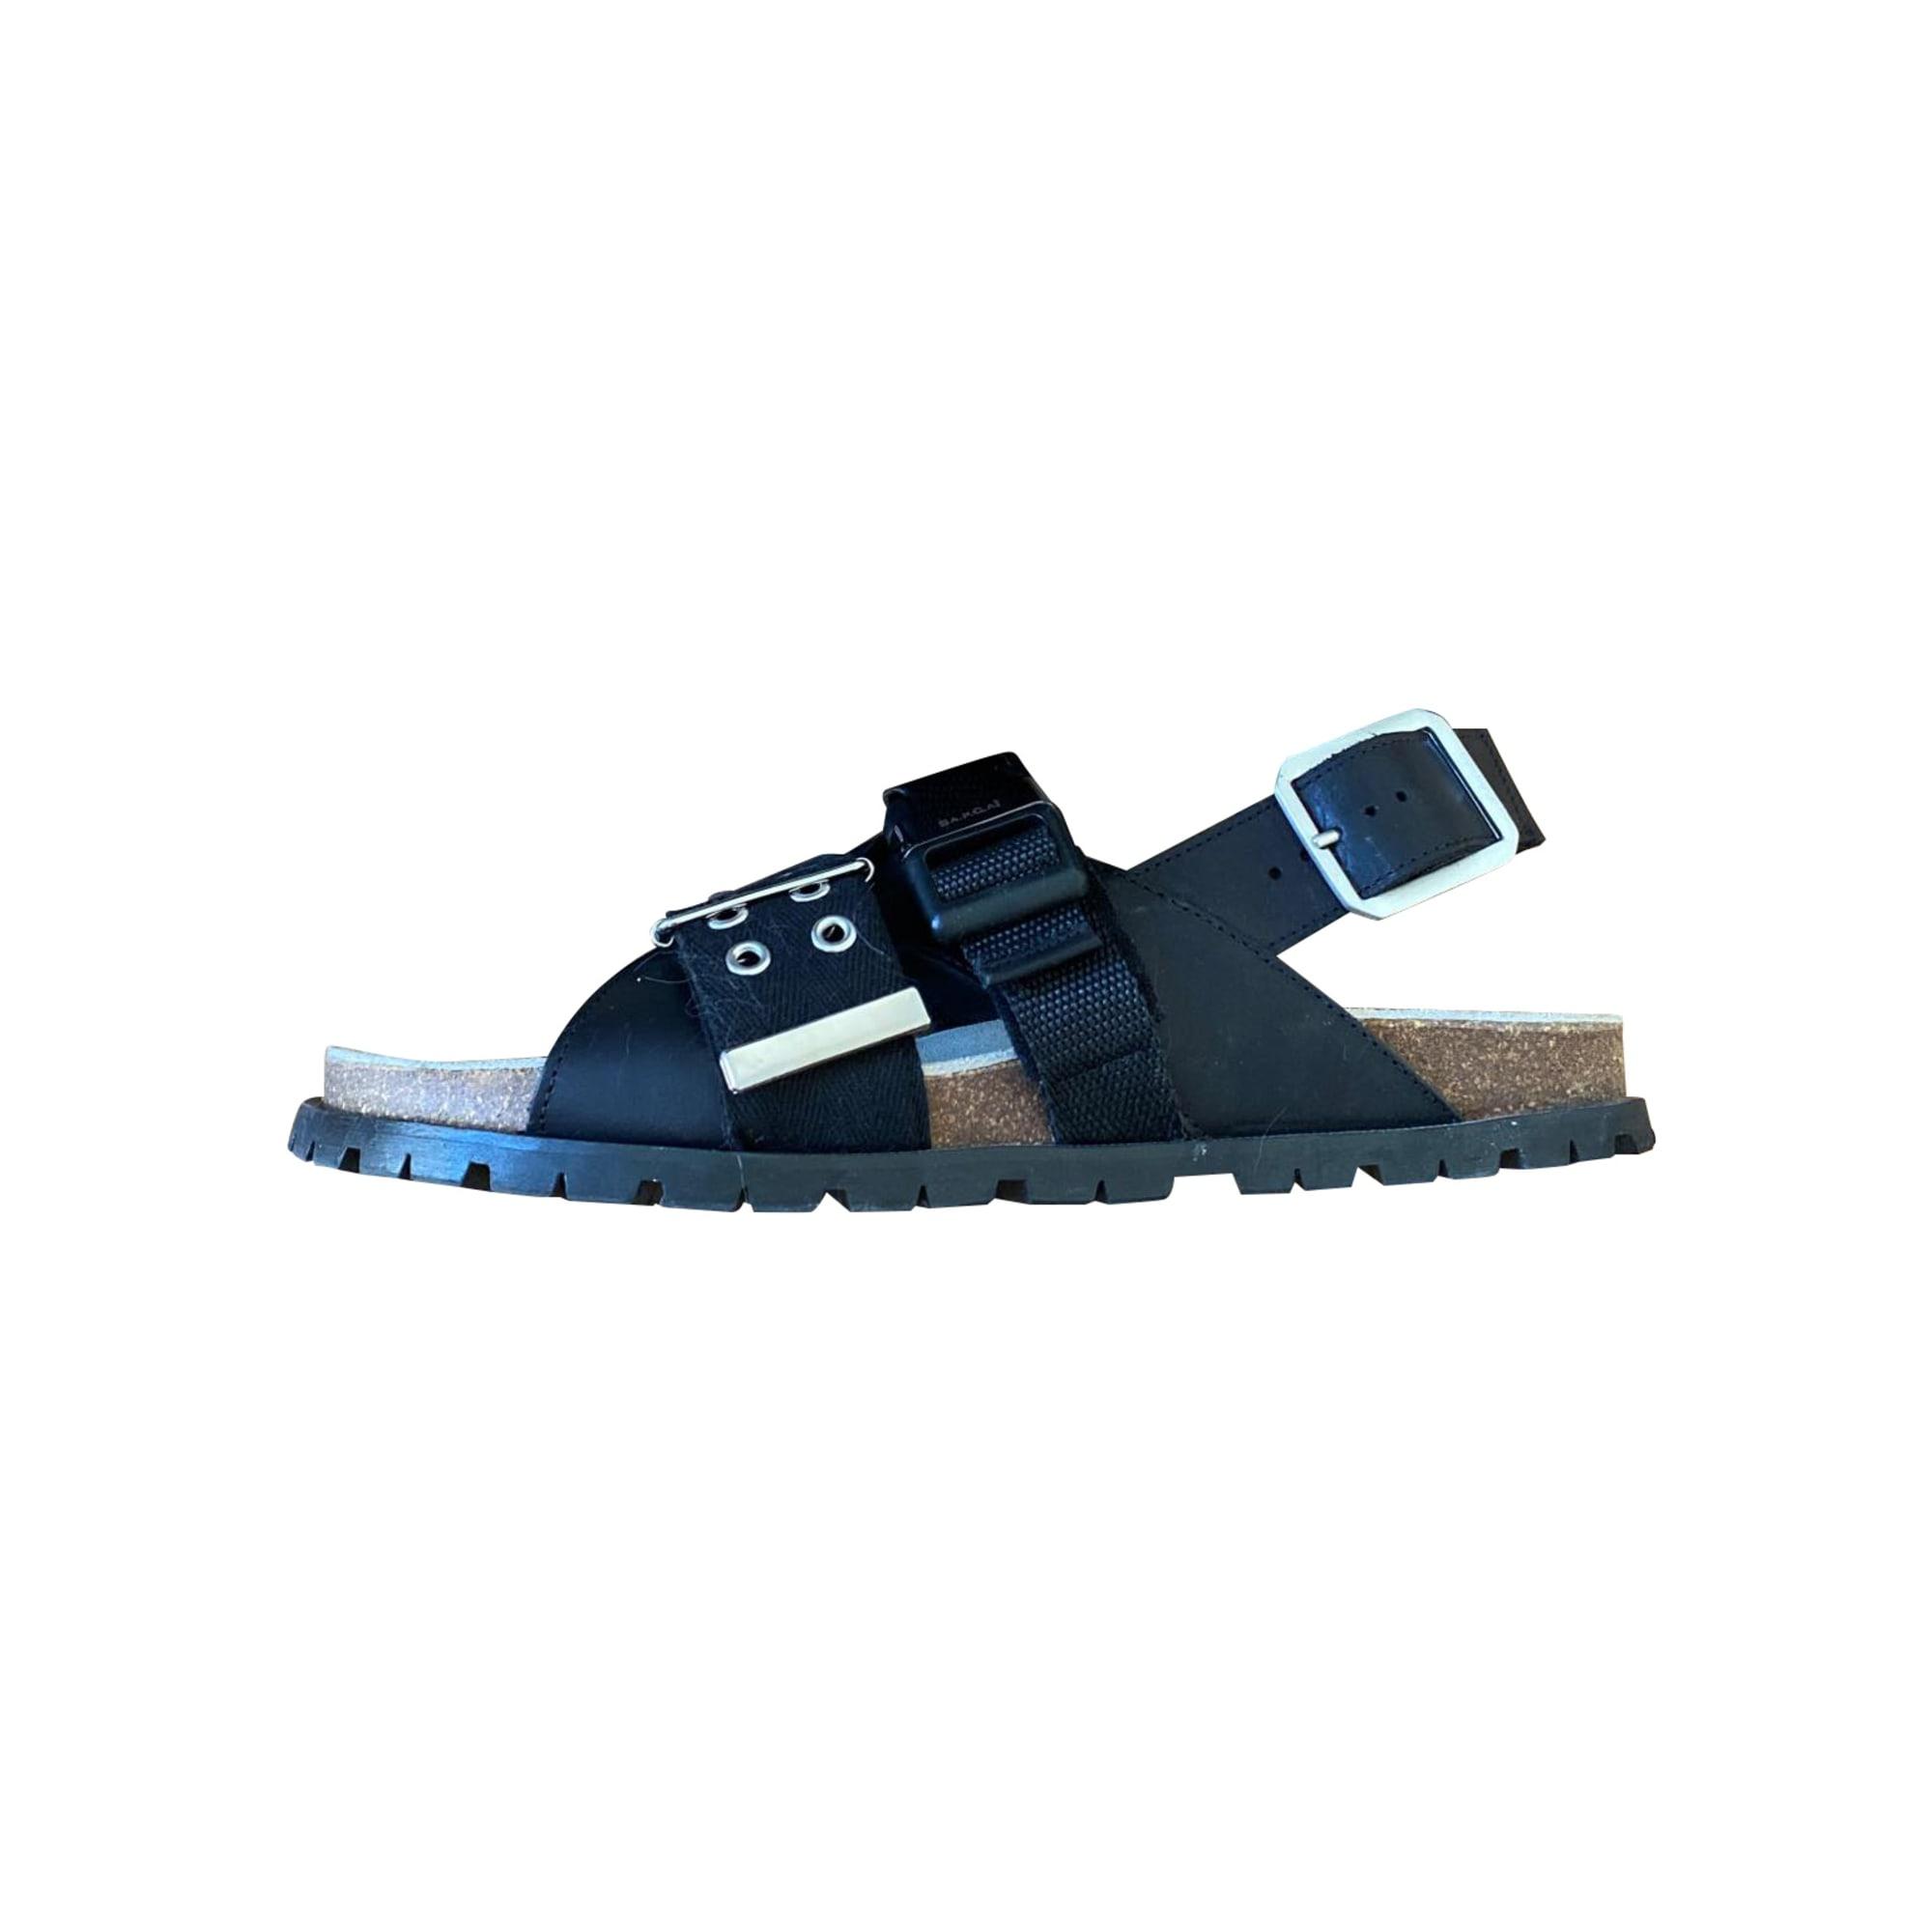 Sandals APC Black